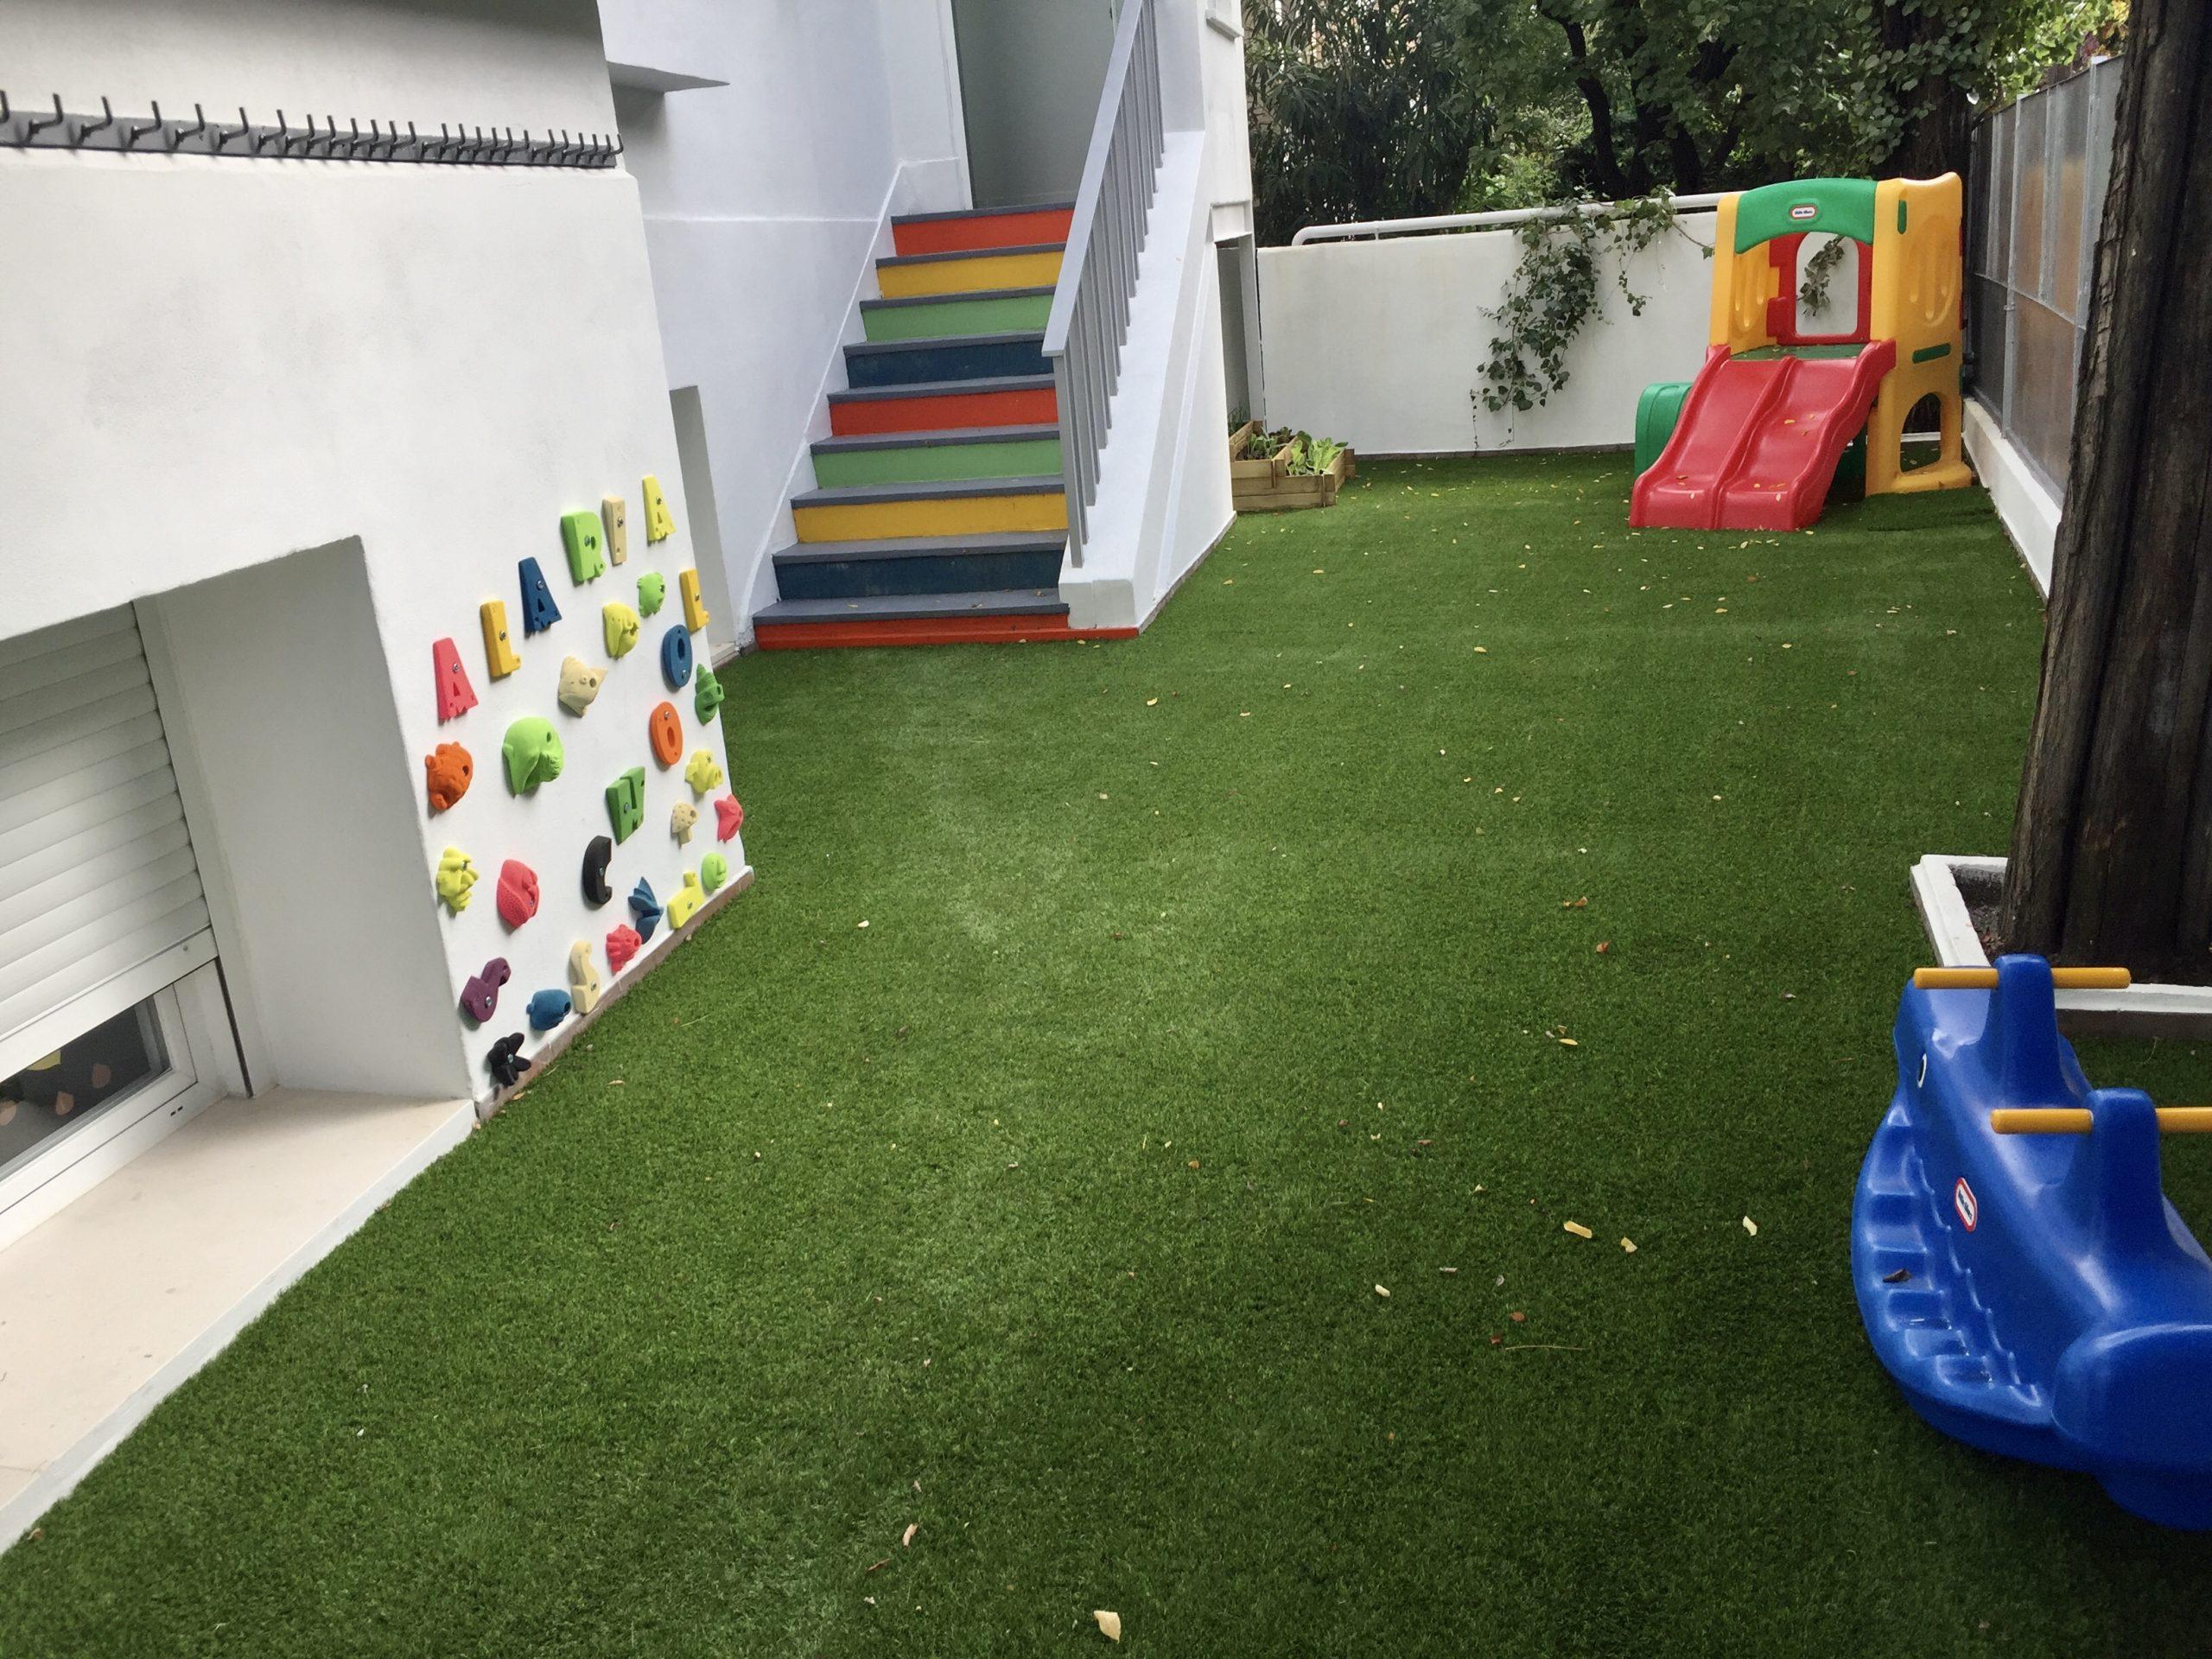 Césped Artificial para Zonas Infantiles